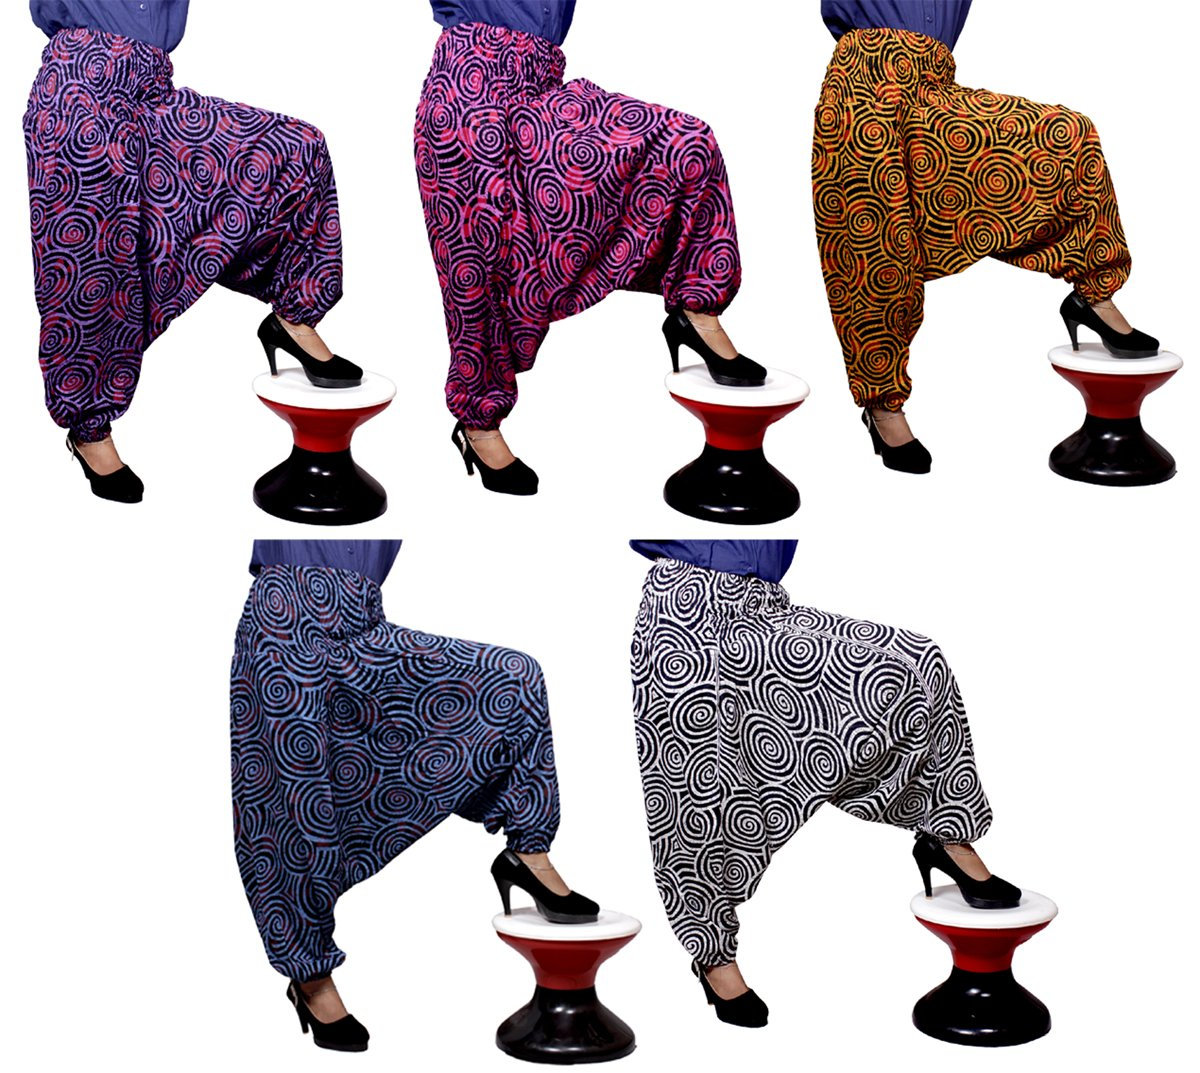 5Pcs-25pcs Printed Genie Harem Circle Design Pants Gypsy India Wholesale Lot (Multi-25pcs)